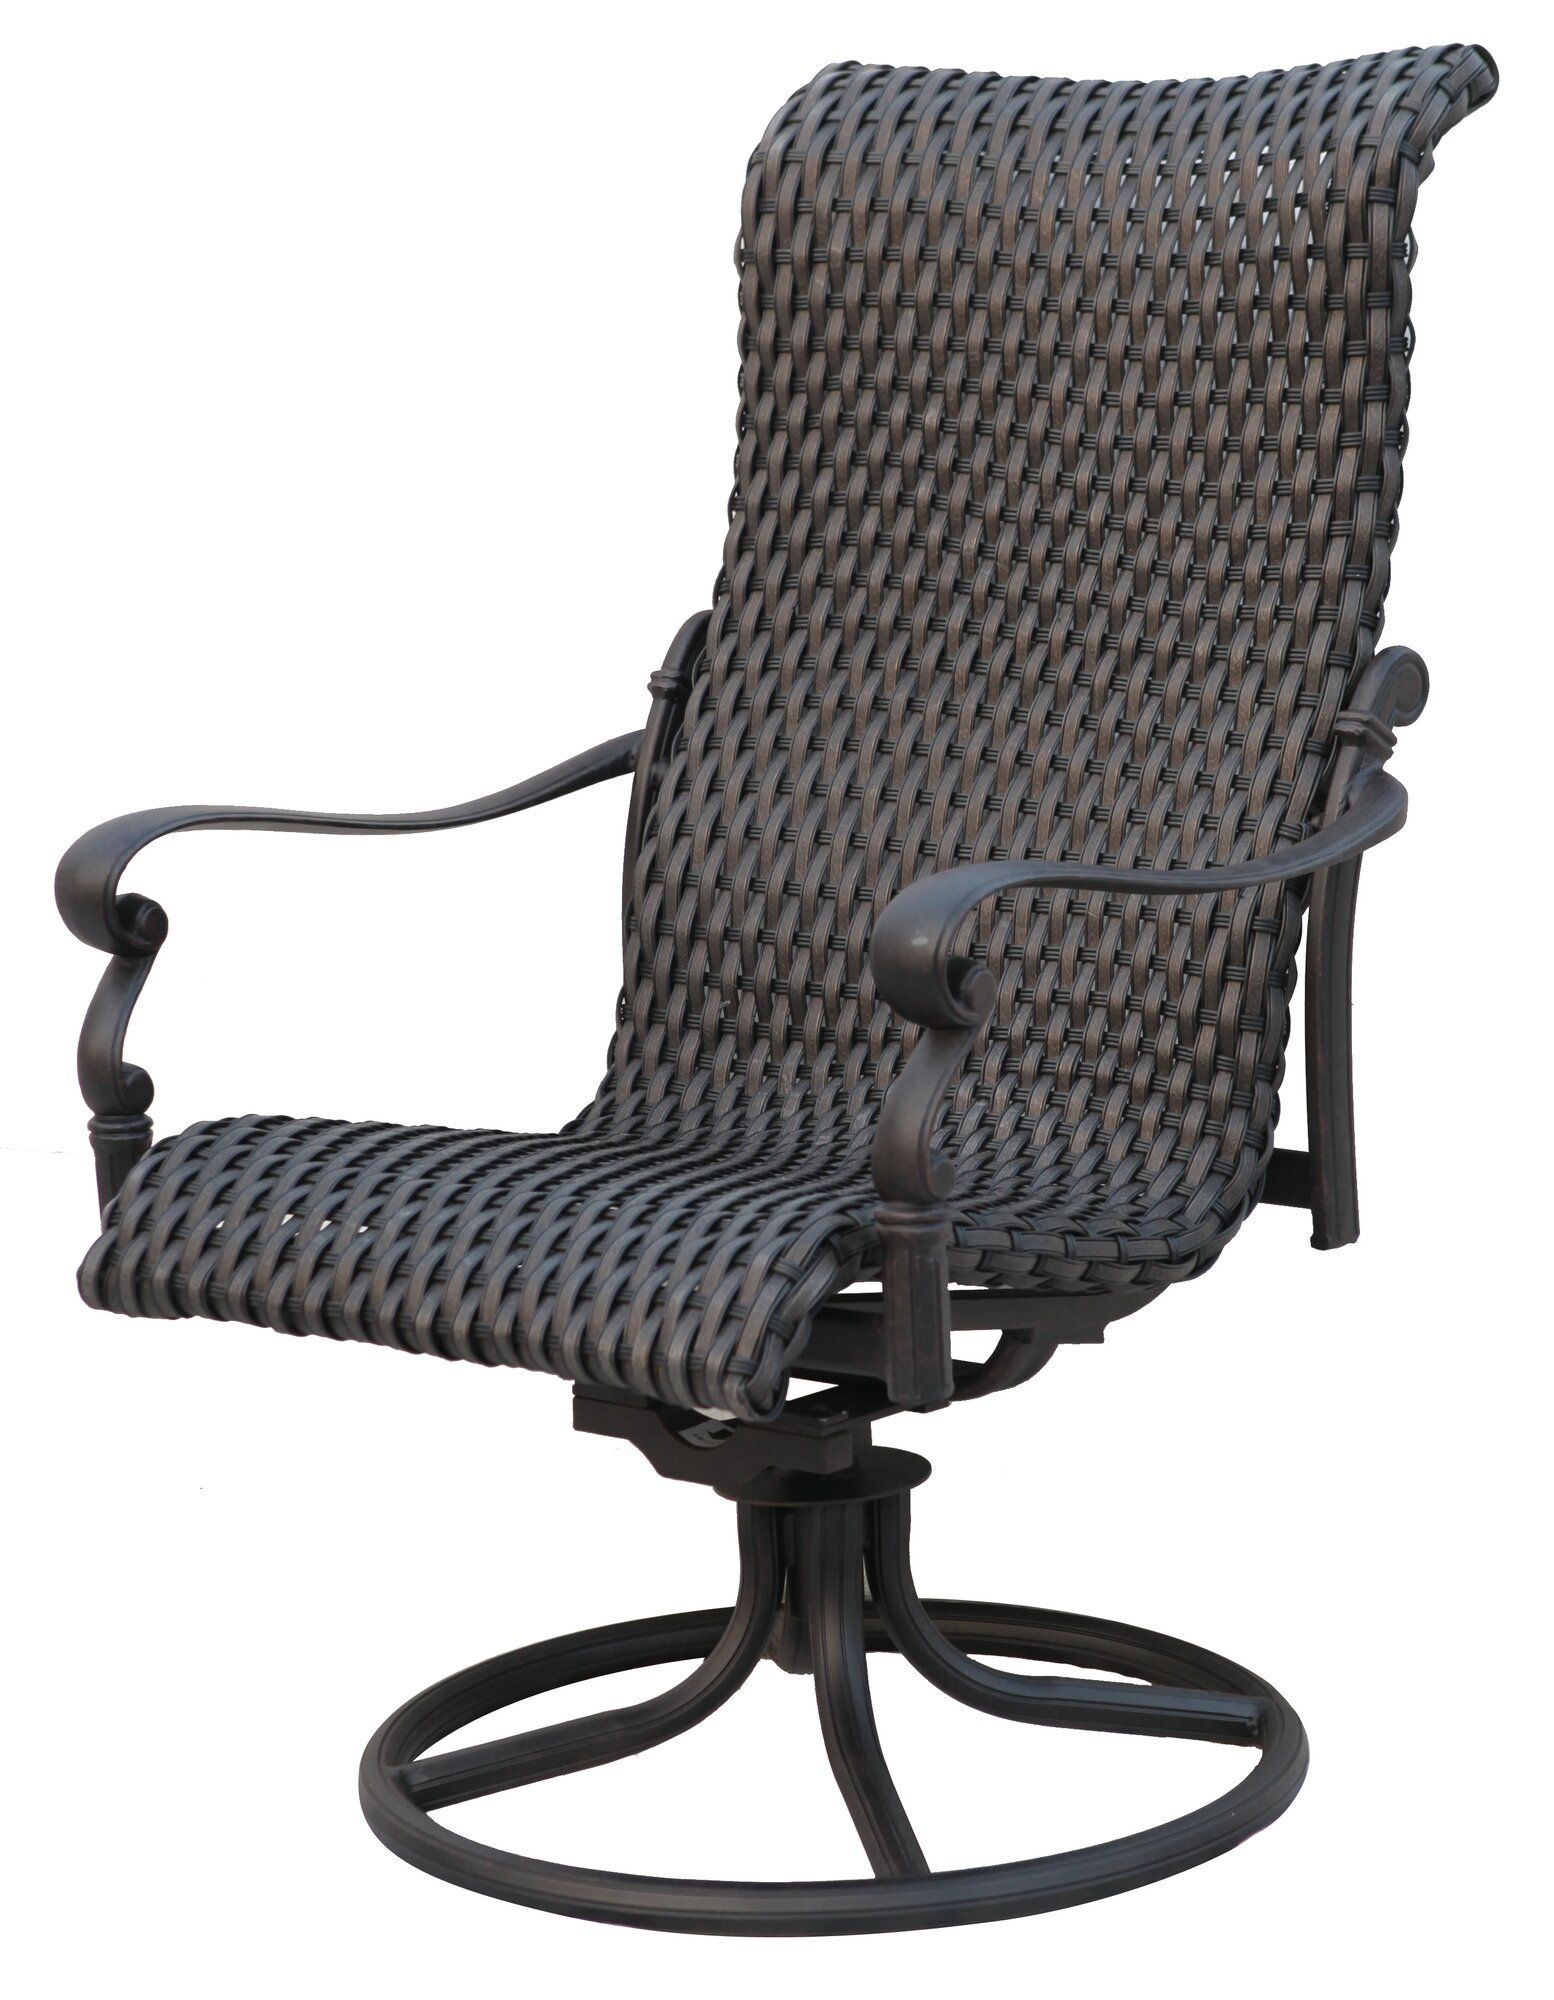 Details About Dar Home Co Kentland Swivel Patio Rocking Chair Set Of 4 regarding measurements 1554 X 2000